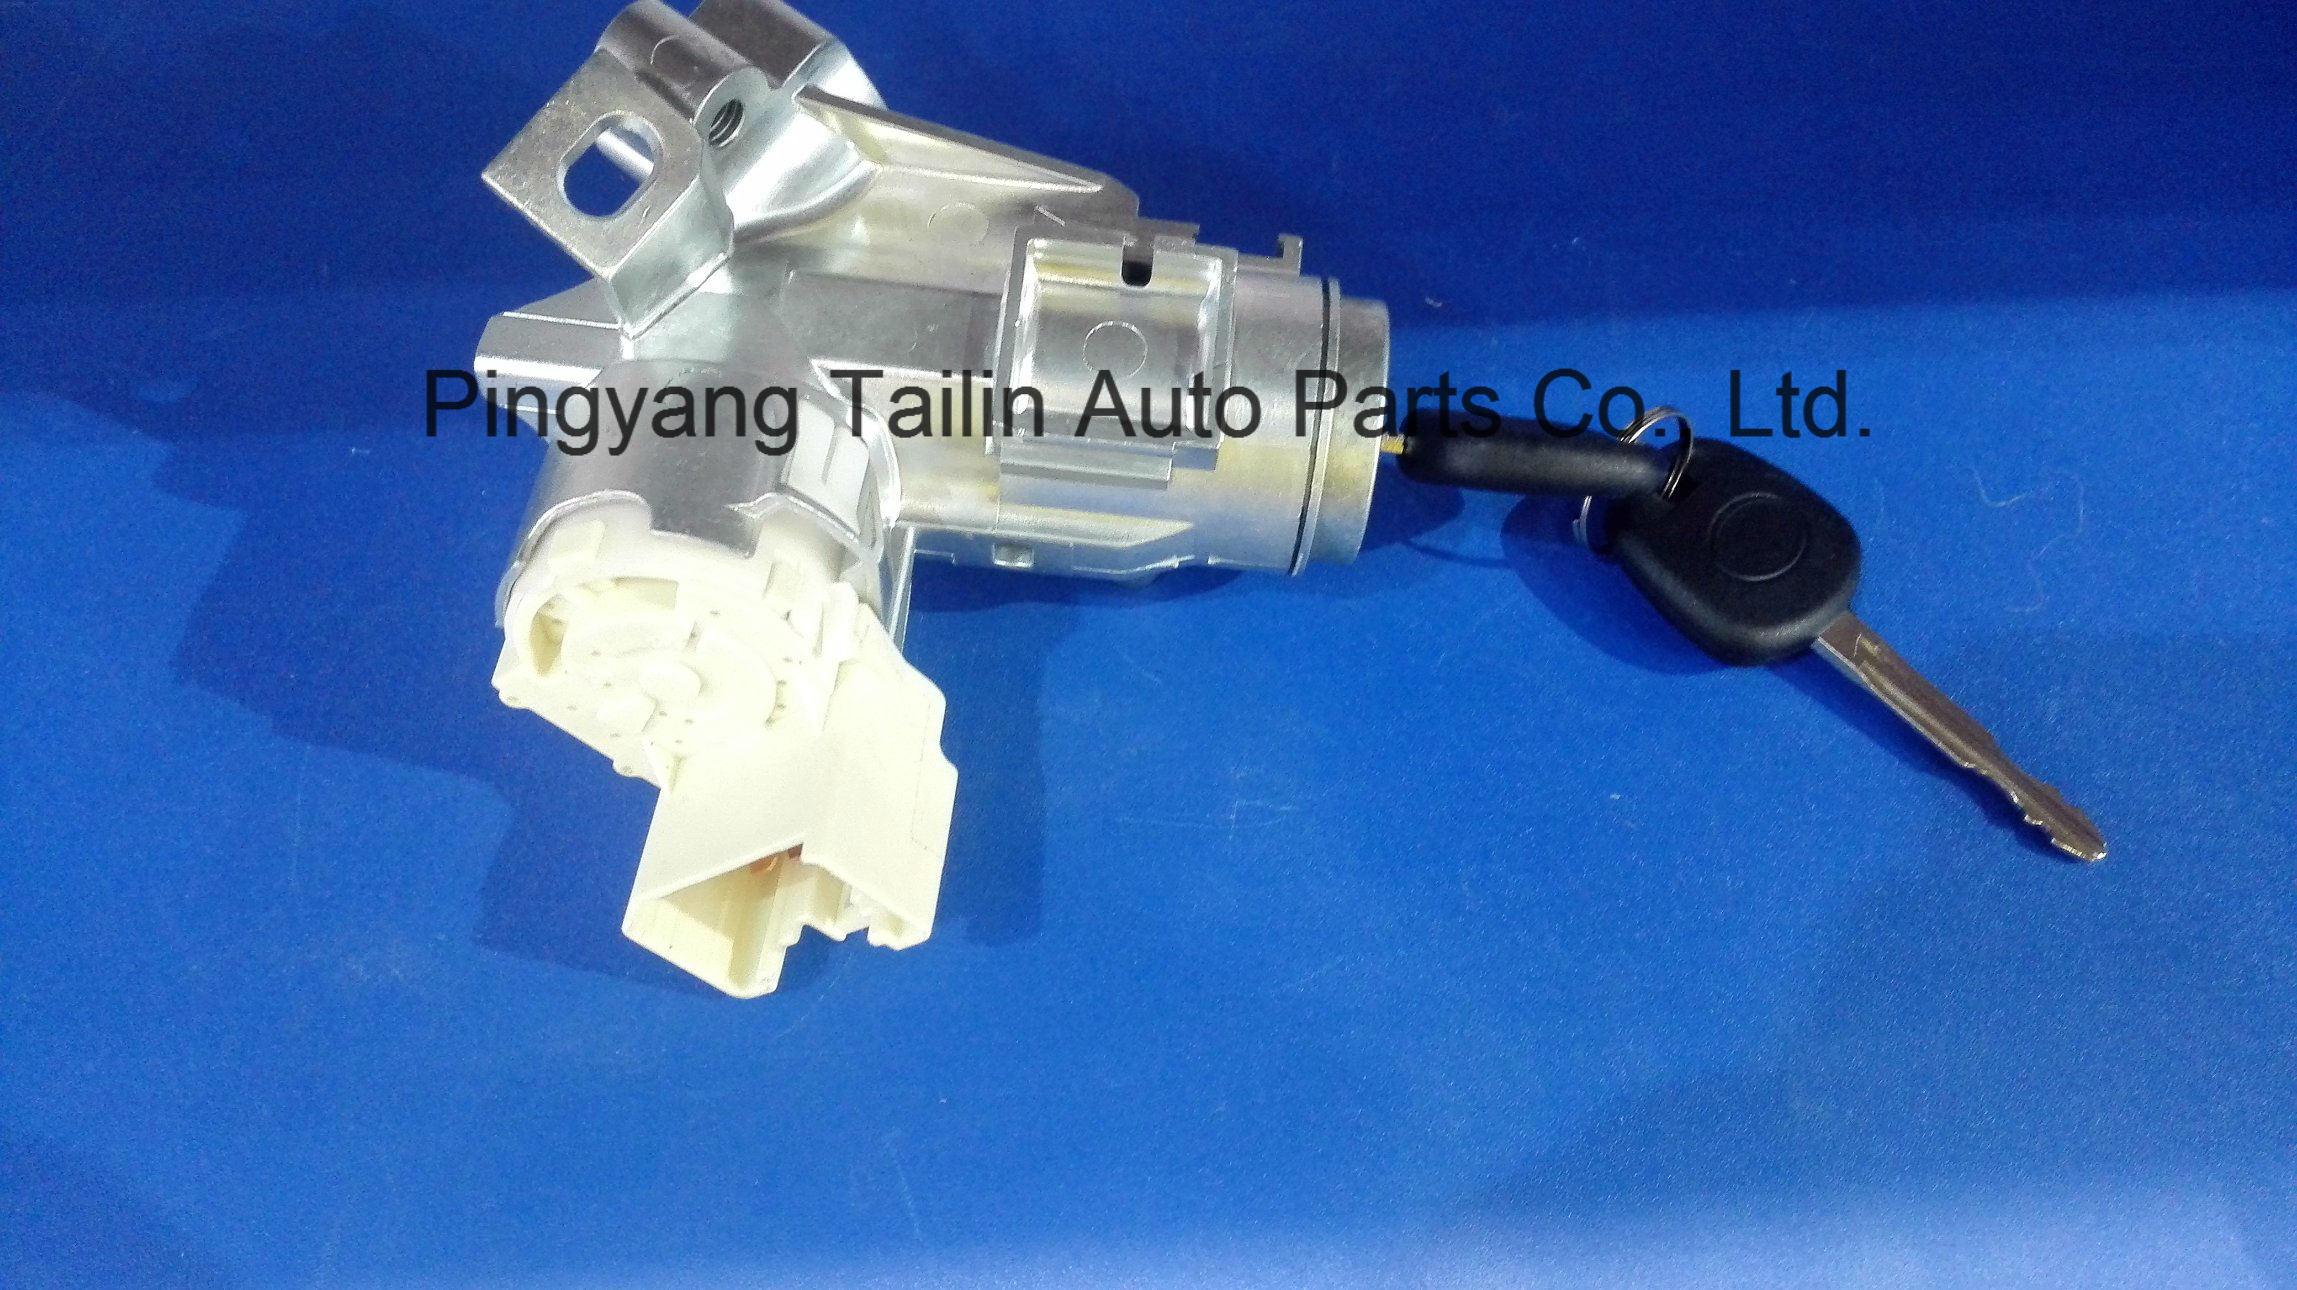 Ignition Switch for Toyota Innova